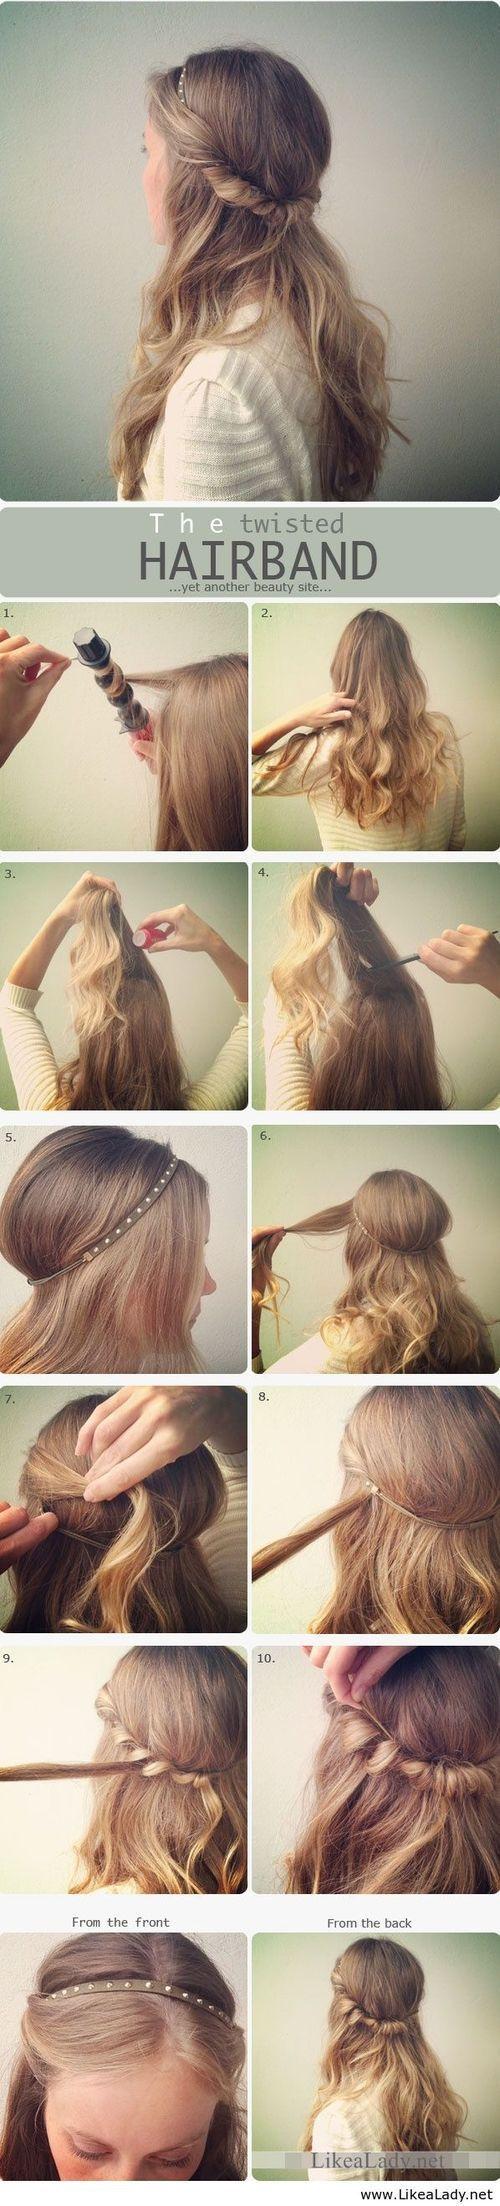 The twisted hairband [ OilsNetwork.com ] #beauty #health #wealth: